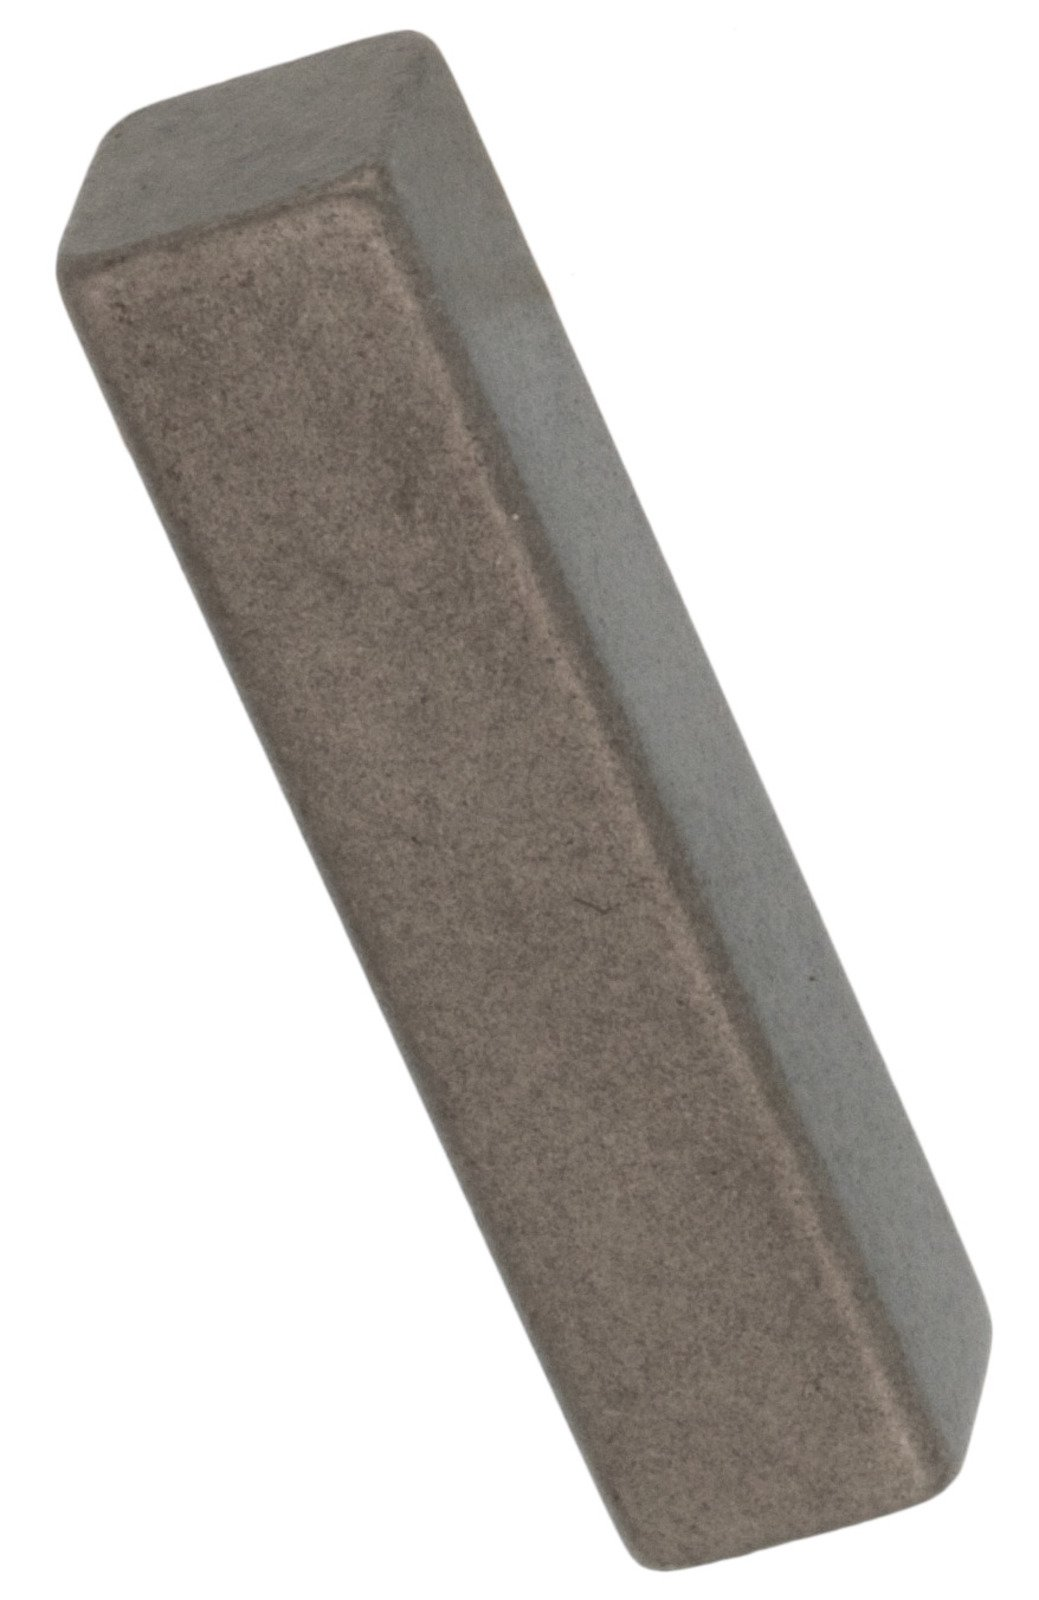 Woodruff Key 27141